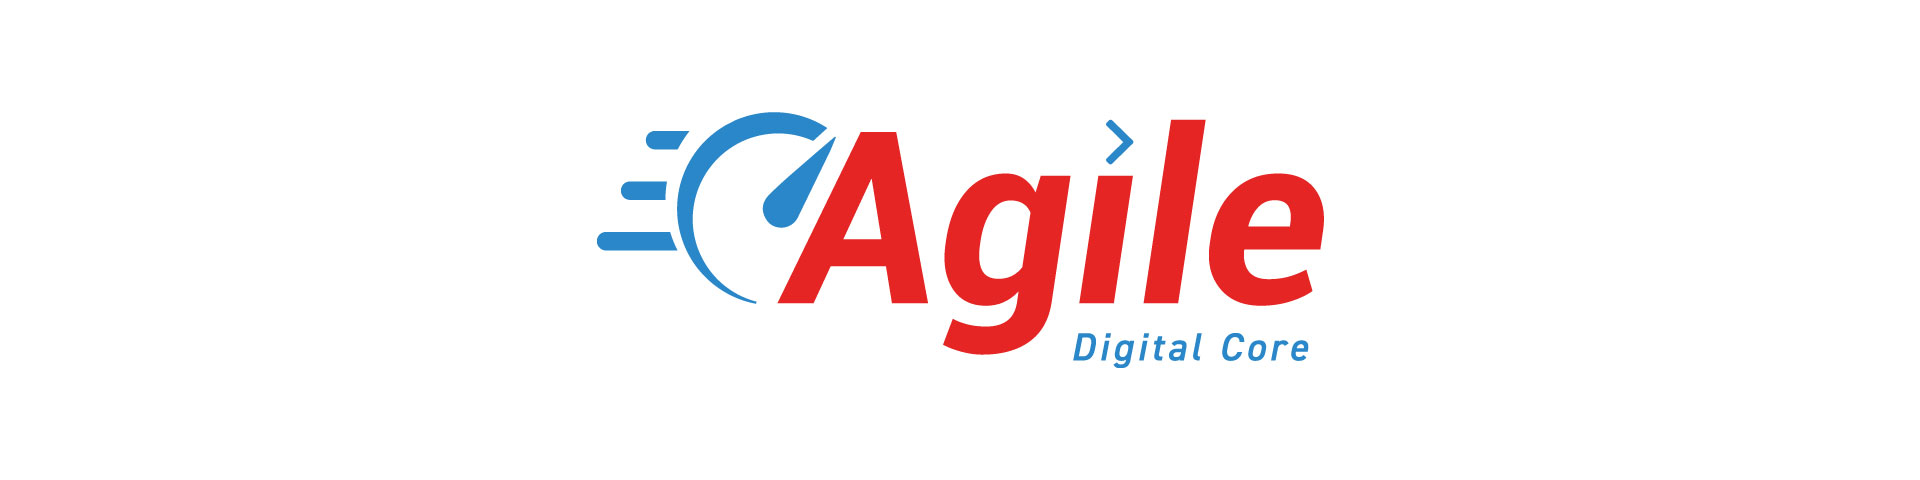 post agile digital core 1